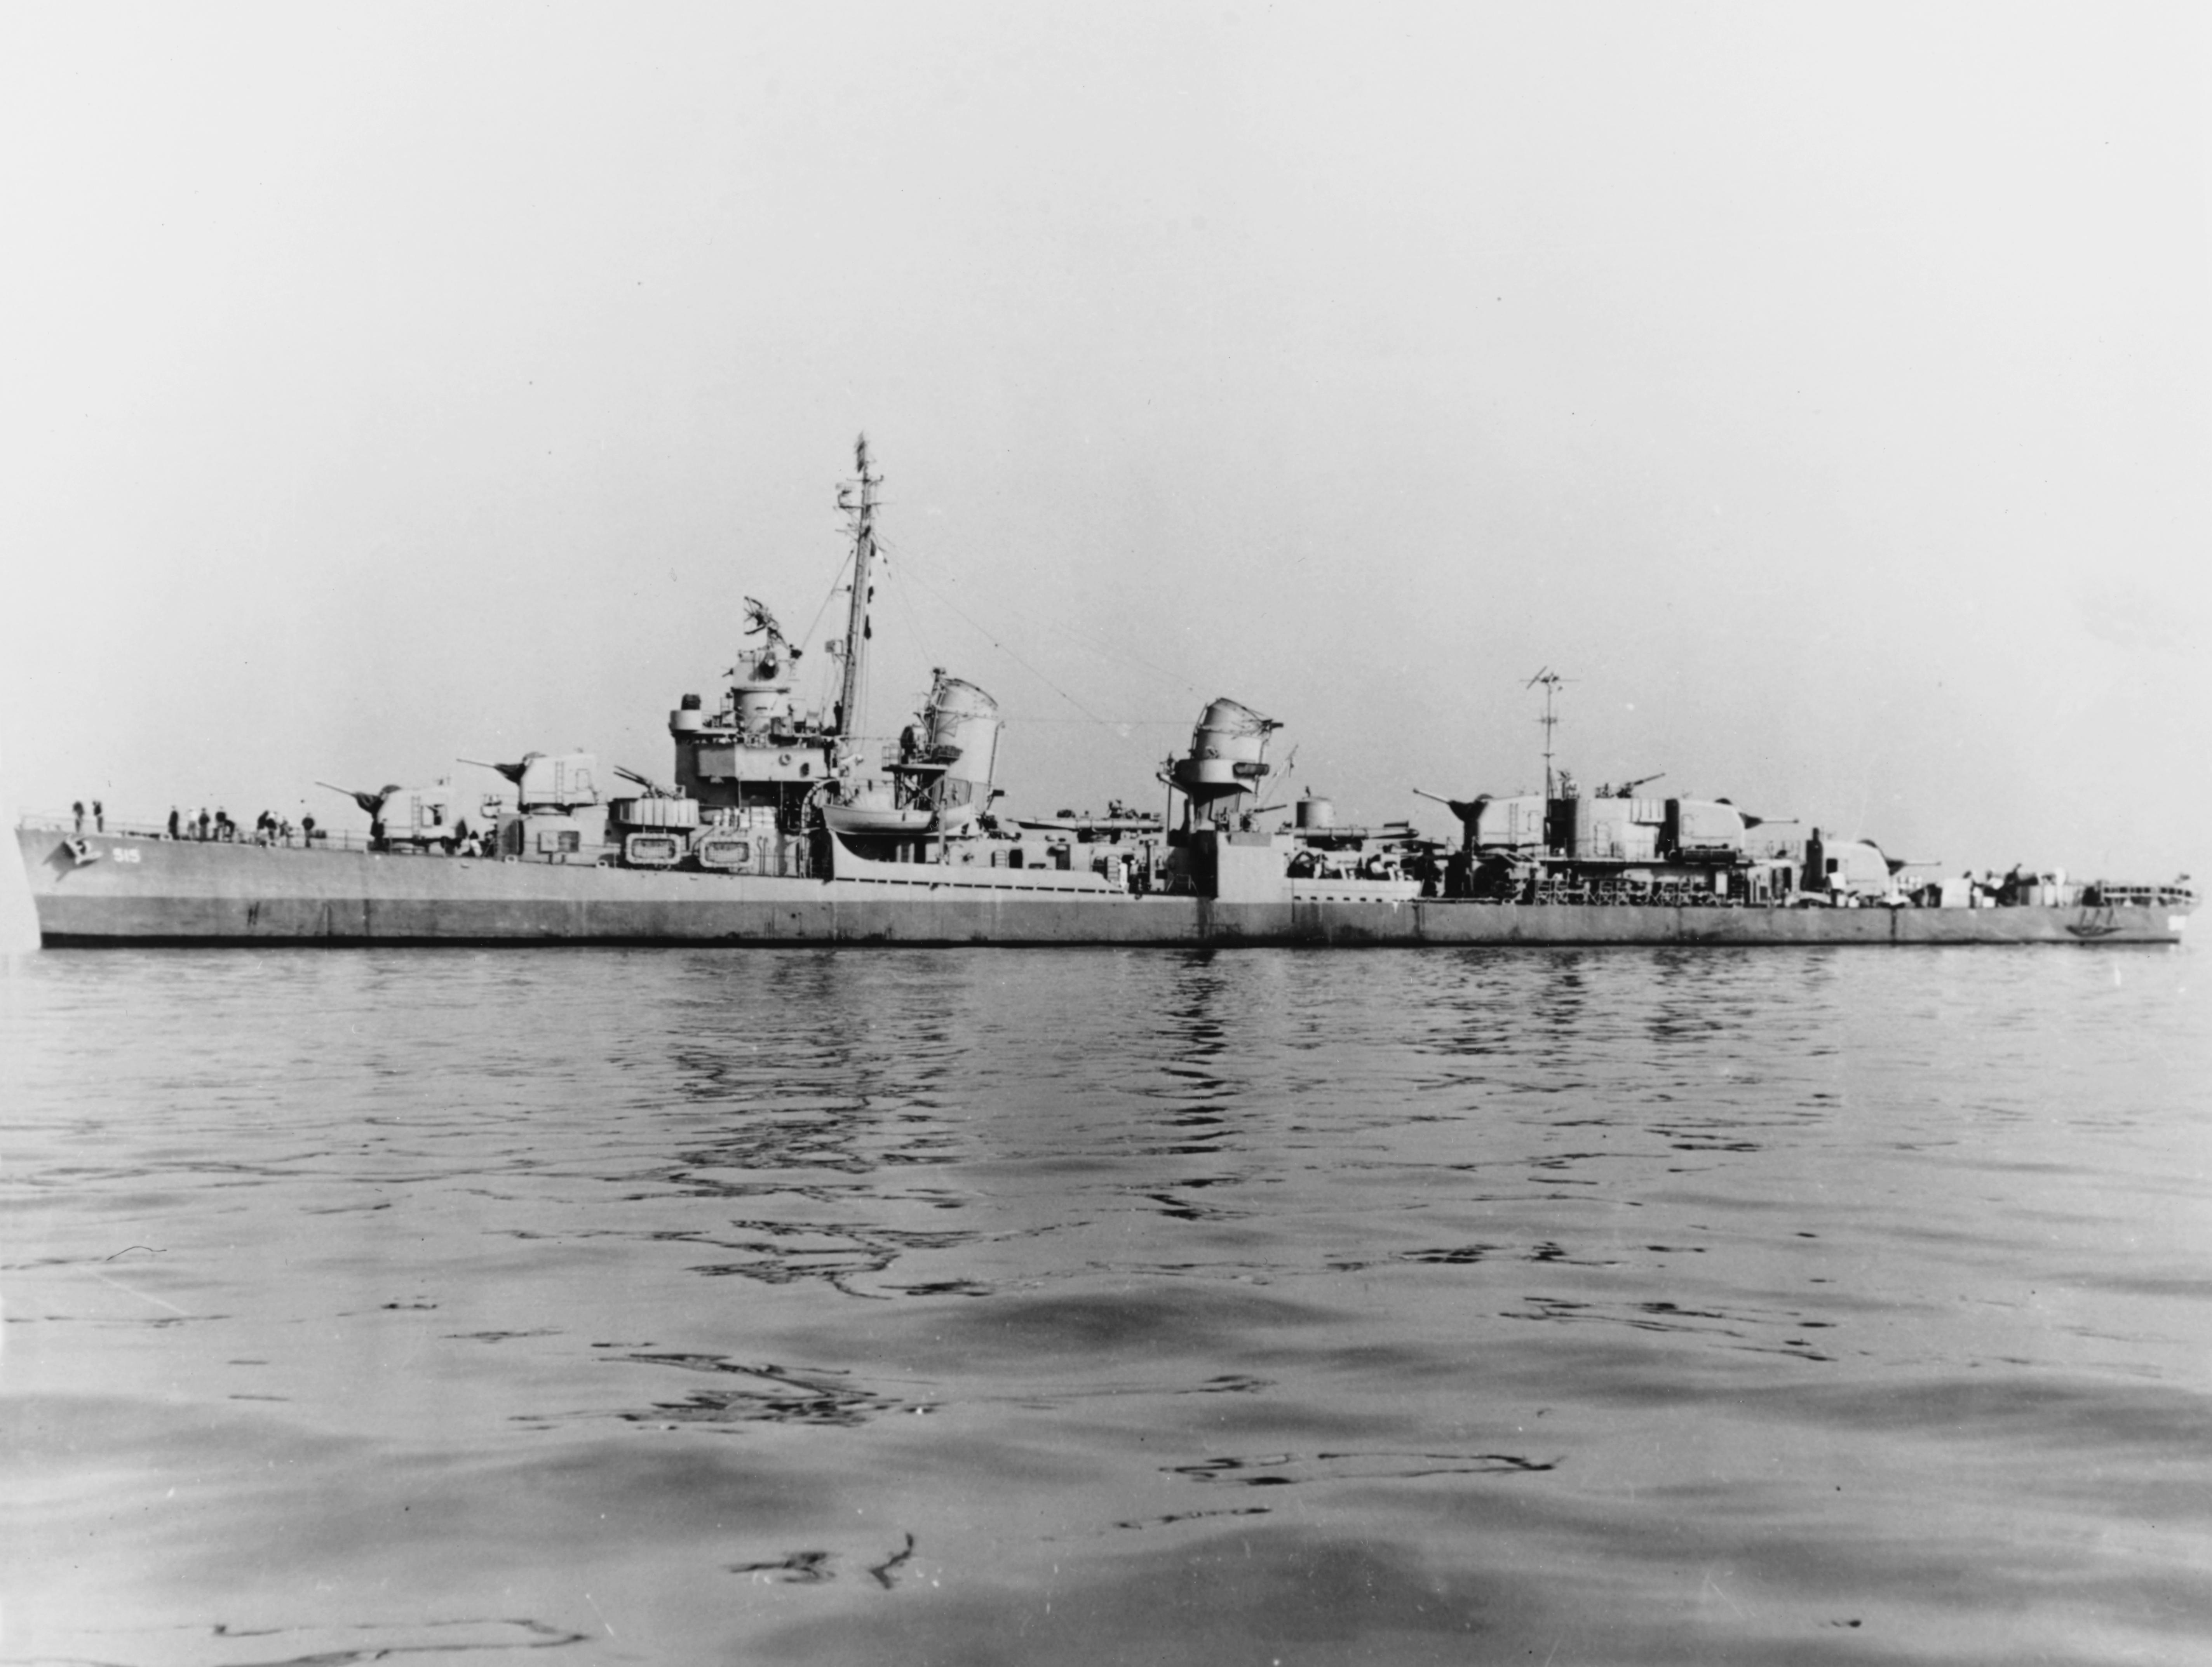 USS Anthony (DD-515) off the Mare Island Navy Yard, California, 8 December 1944